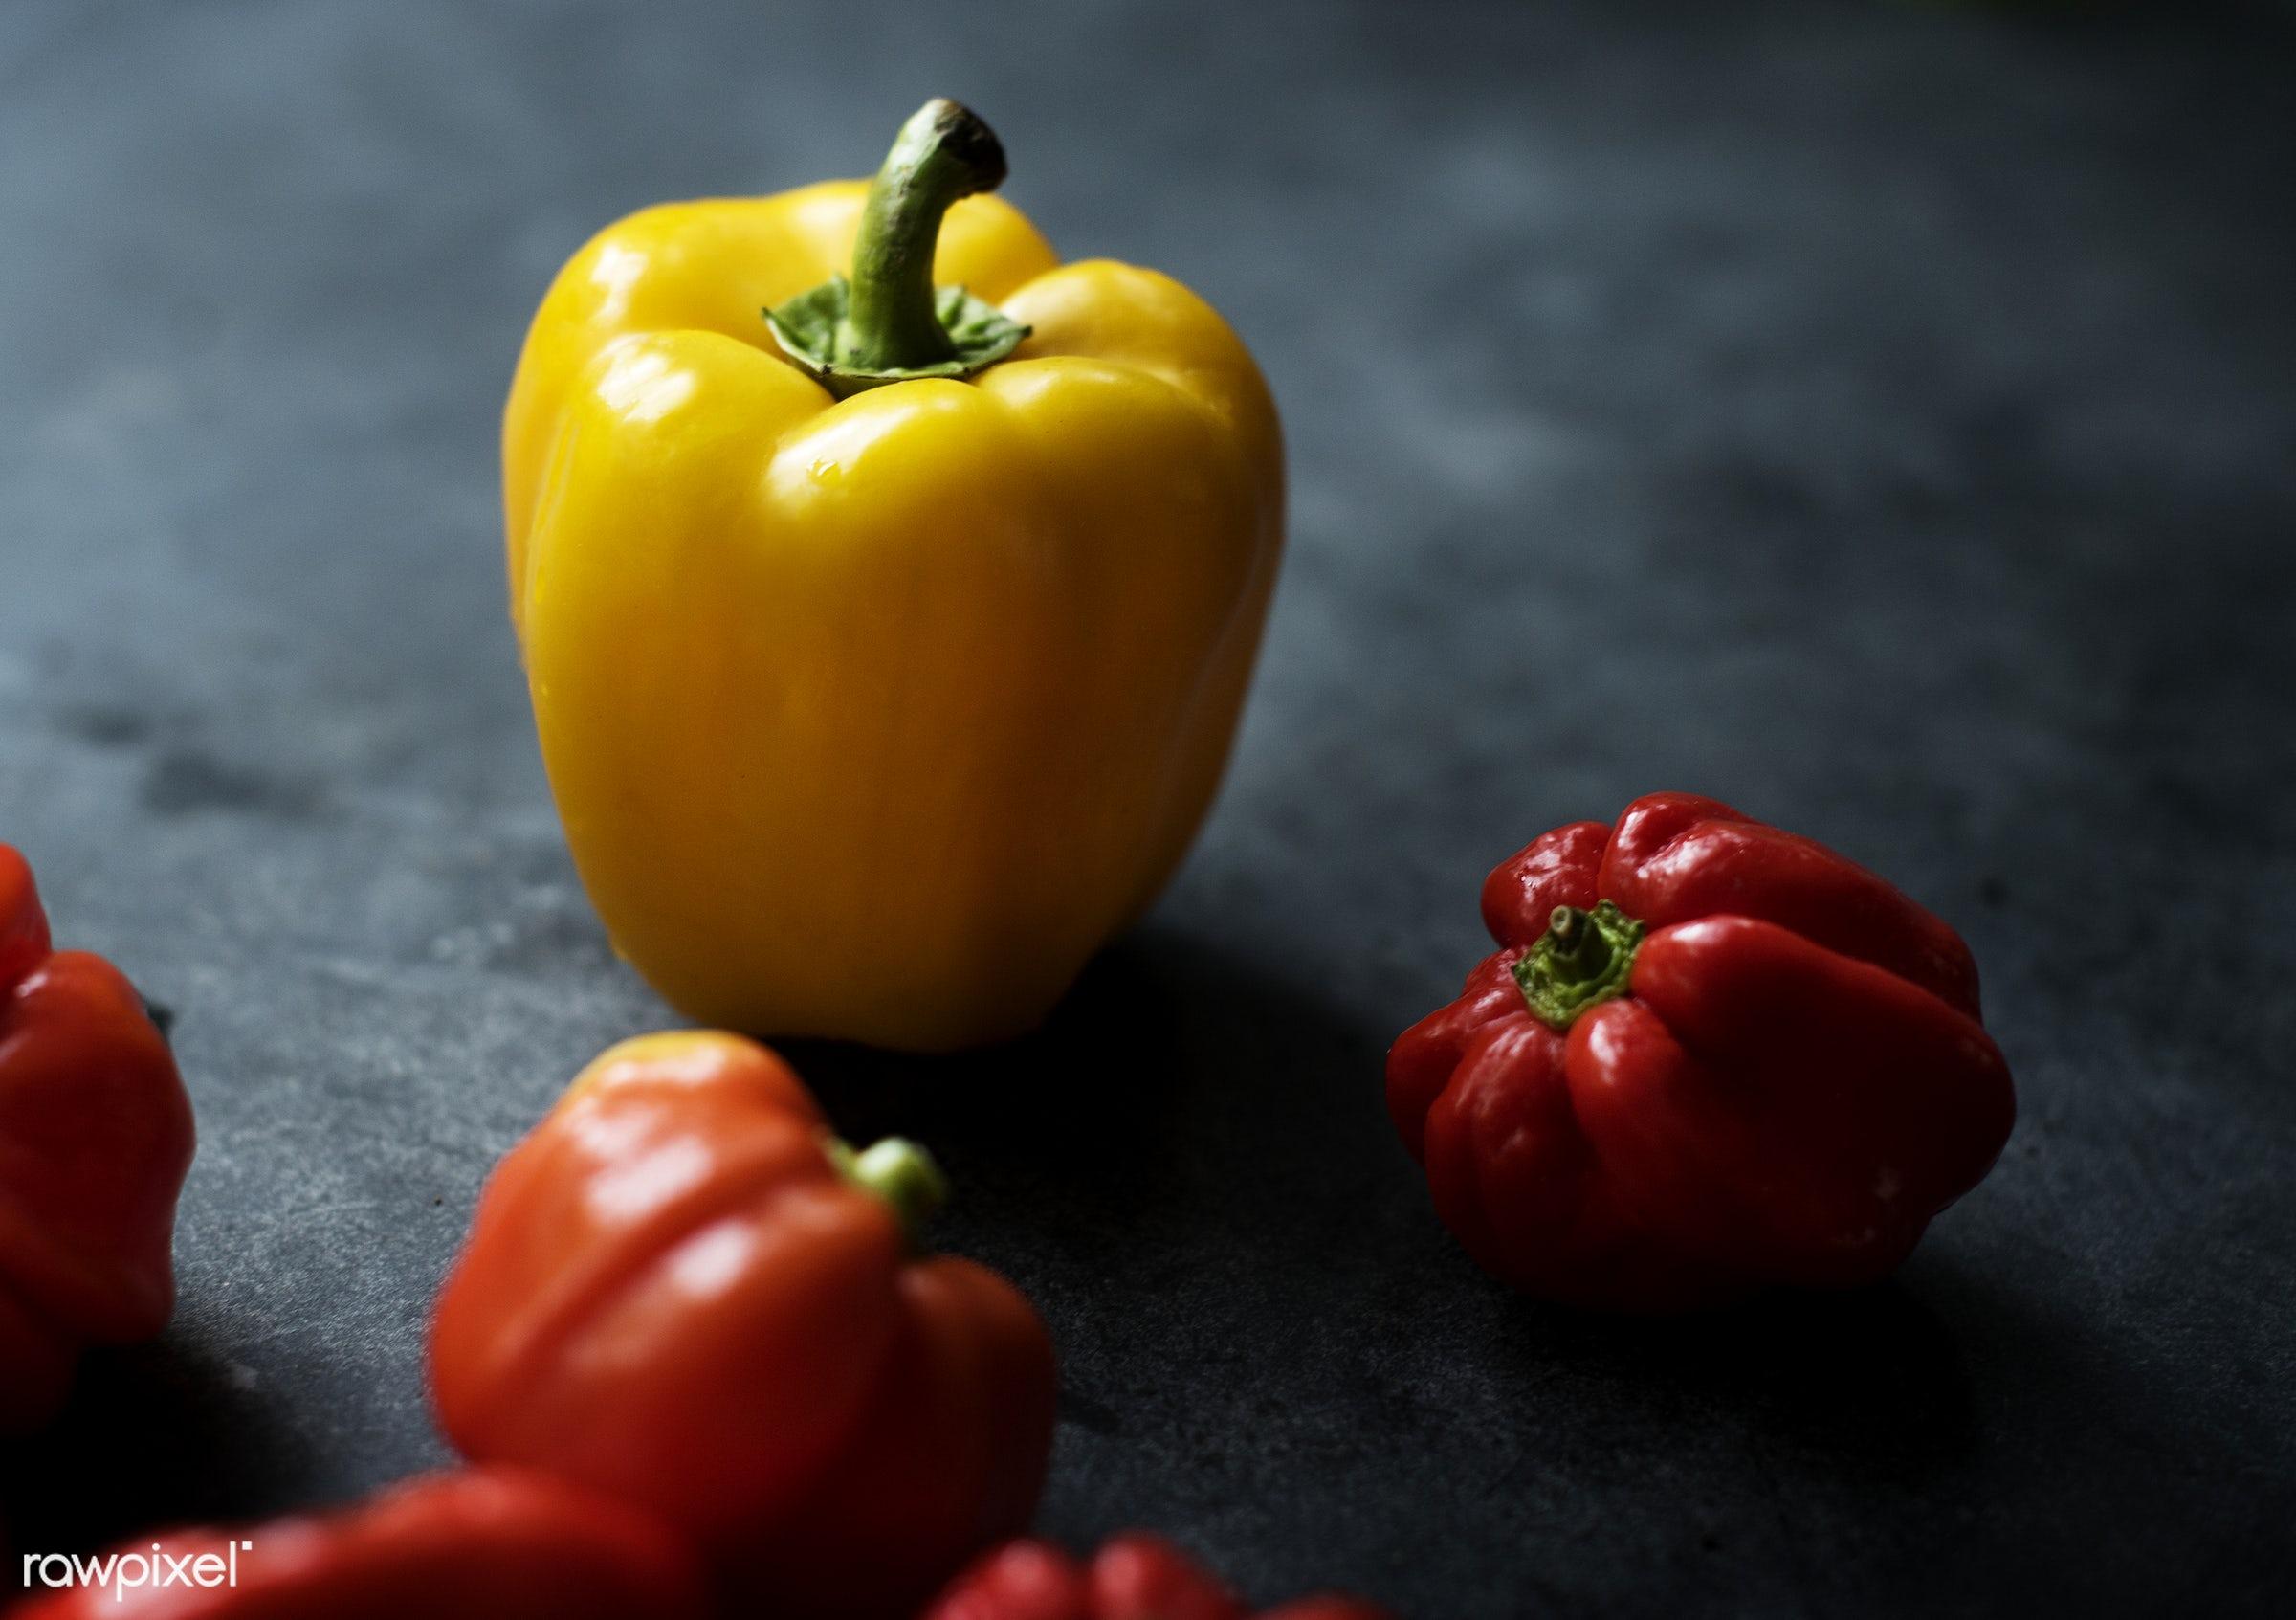 Fresh sweet bell peppers - raw, organic, nature, fresh, habanero, healthy, sweet pepper, harvest, vegetable, closeup, food,...